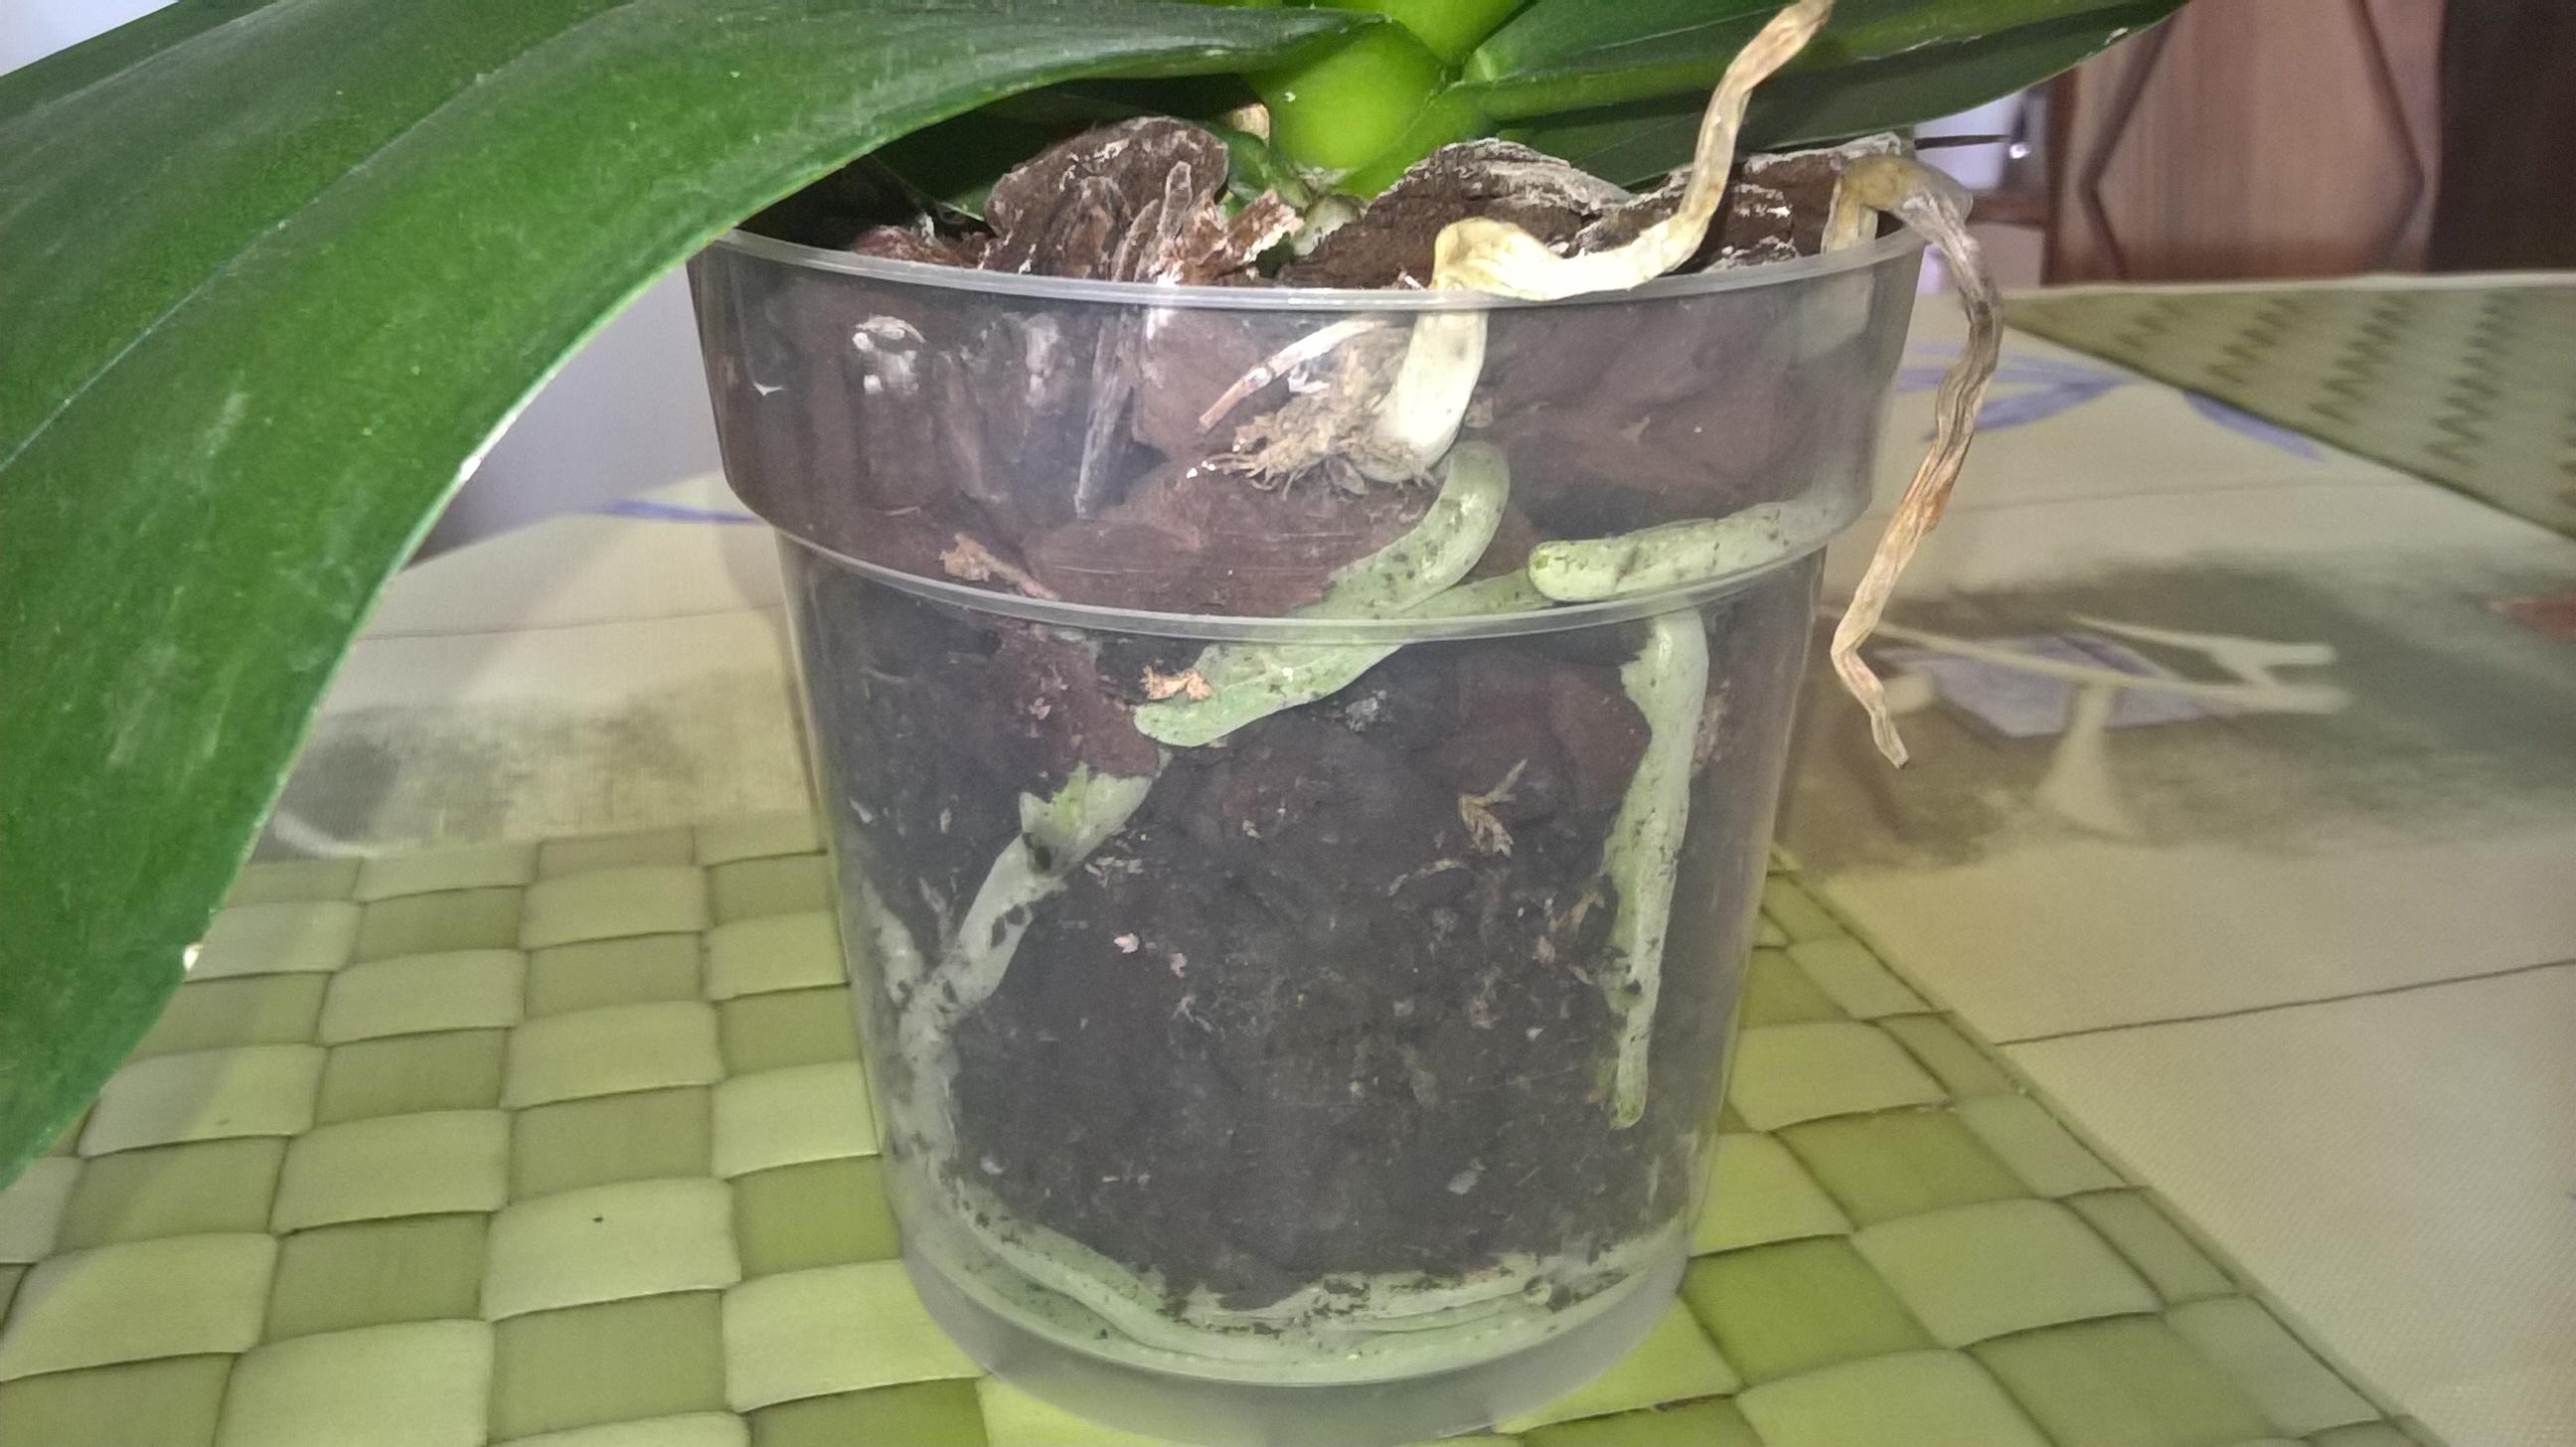 phalaenopsis défleuries  - Page 2 296801WP20160730112739Pro